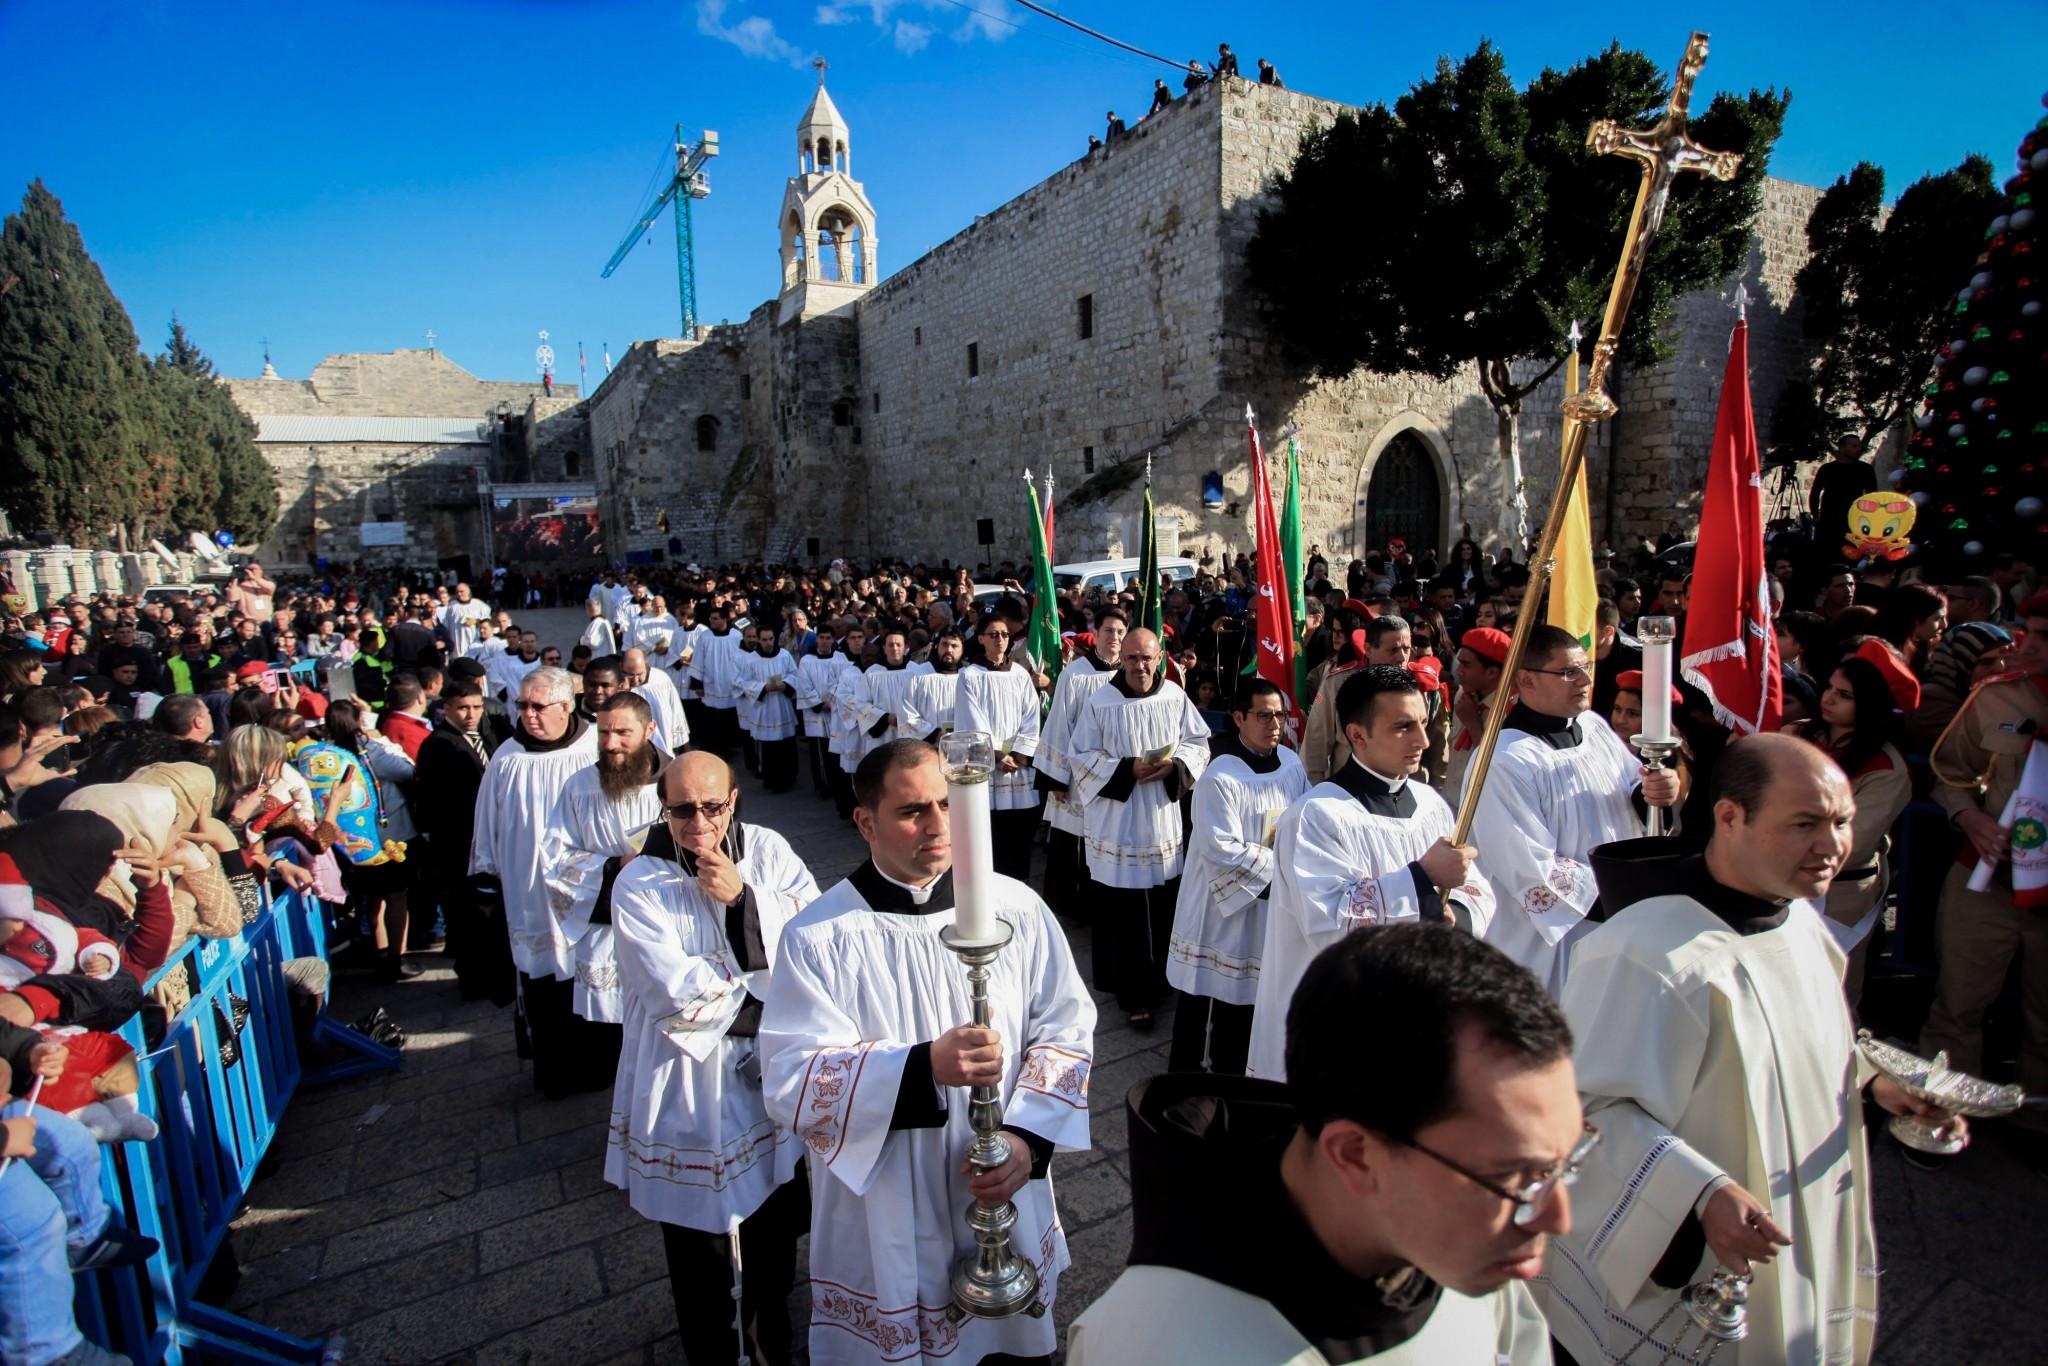 Catholic clergymen outside the Church of the Nativity in Bethlehem. Photo by FLASH90